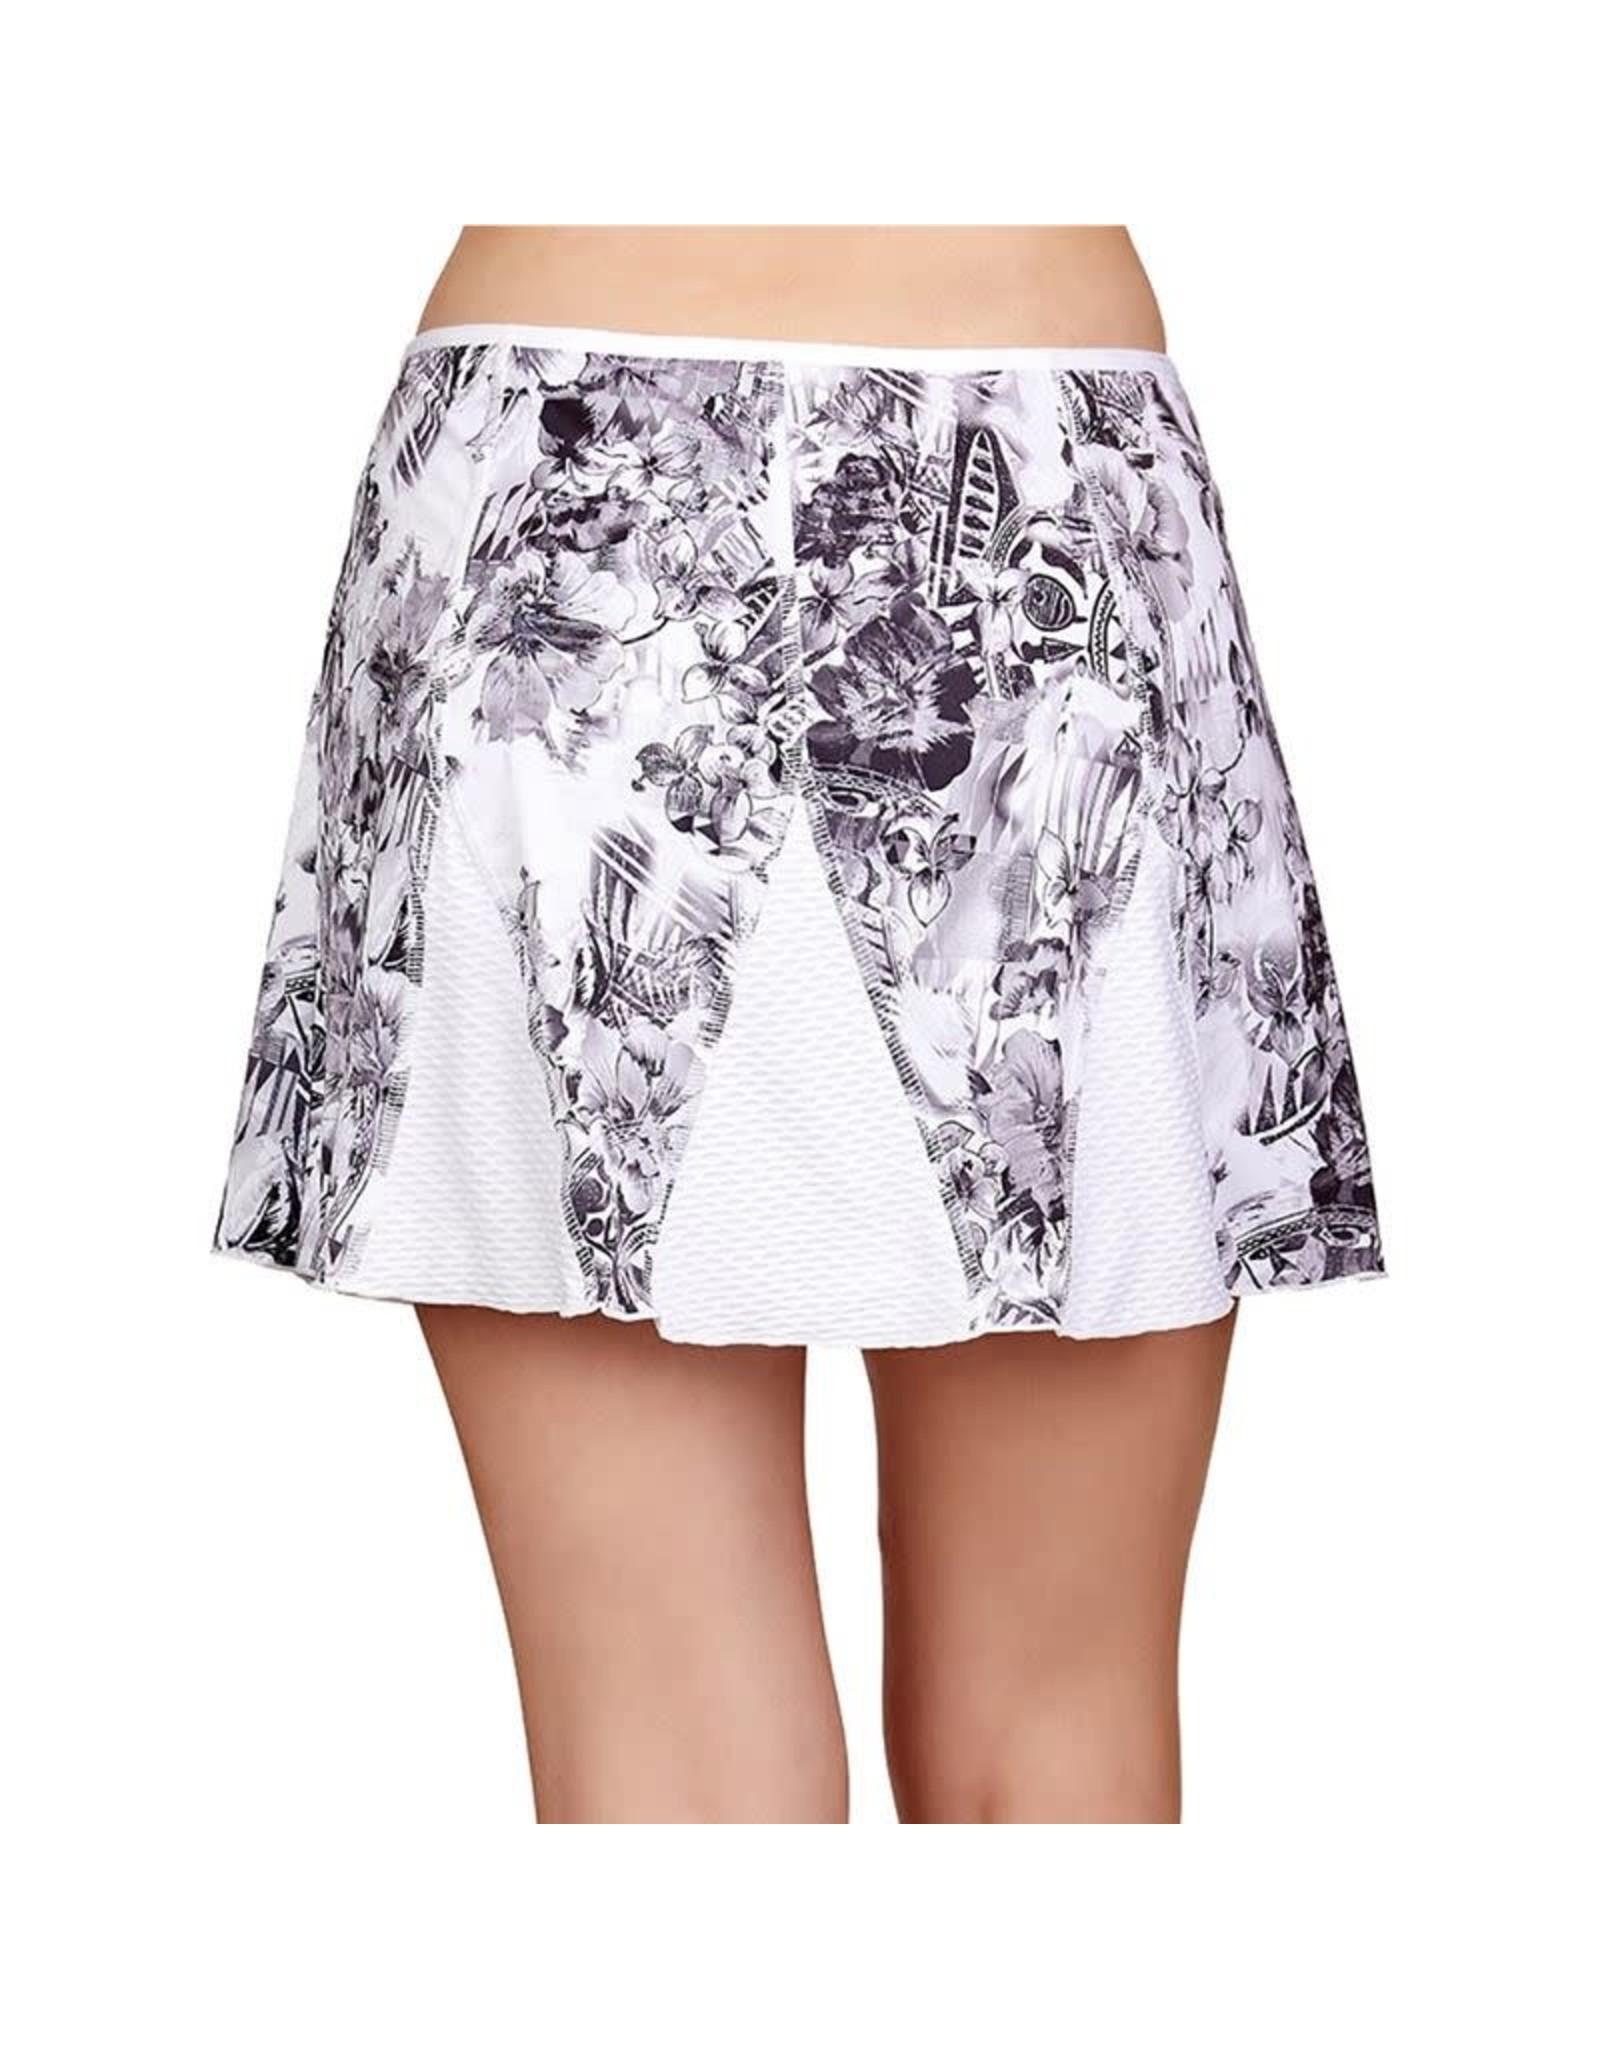 Sofibella Match Point 14 inch Skirt